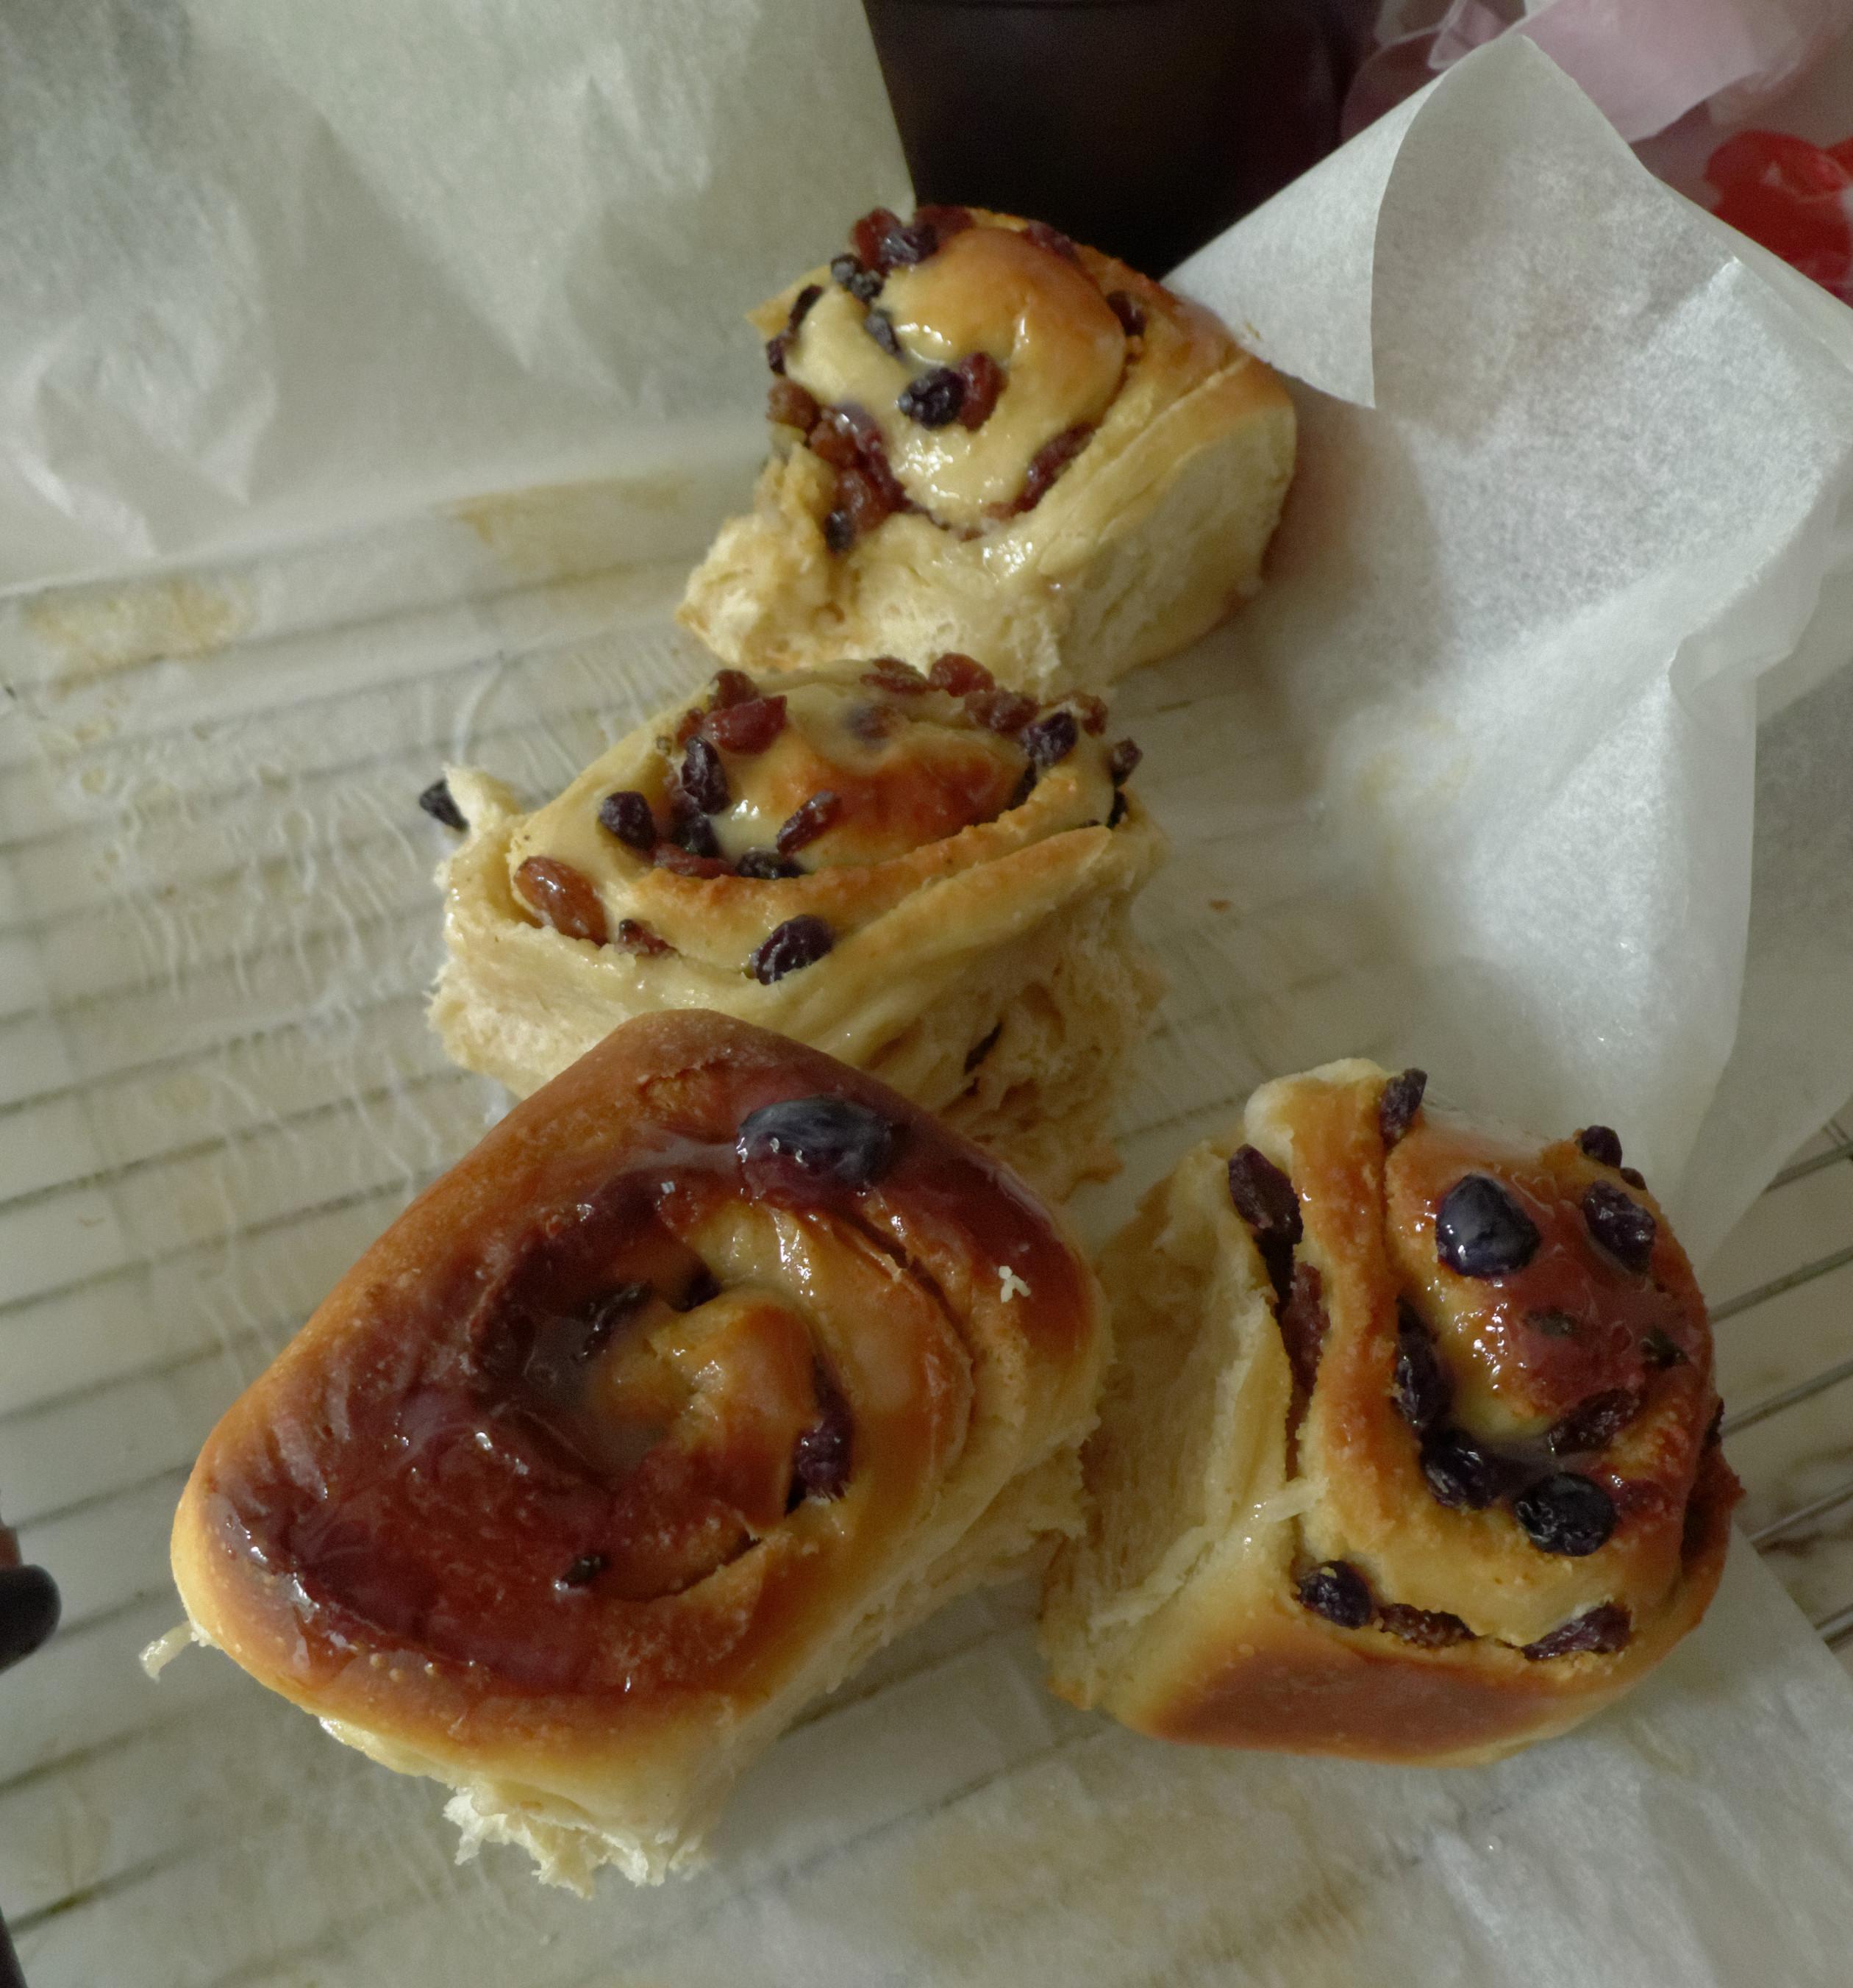 Matured sourdough buns